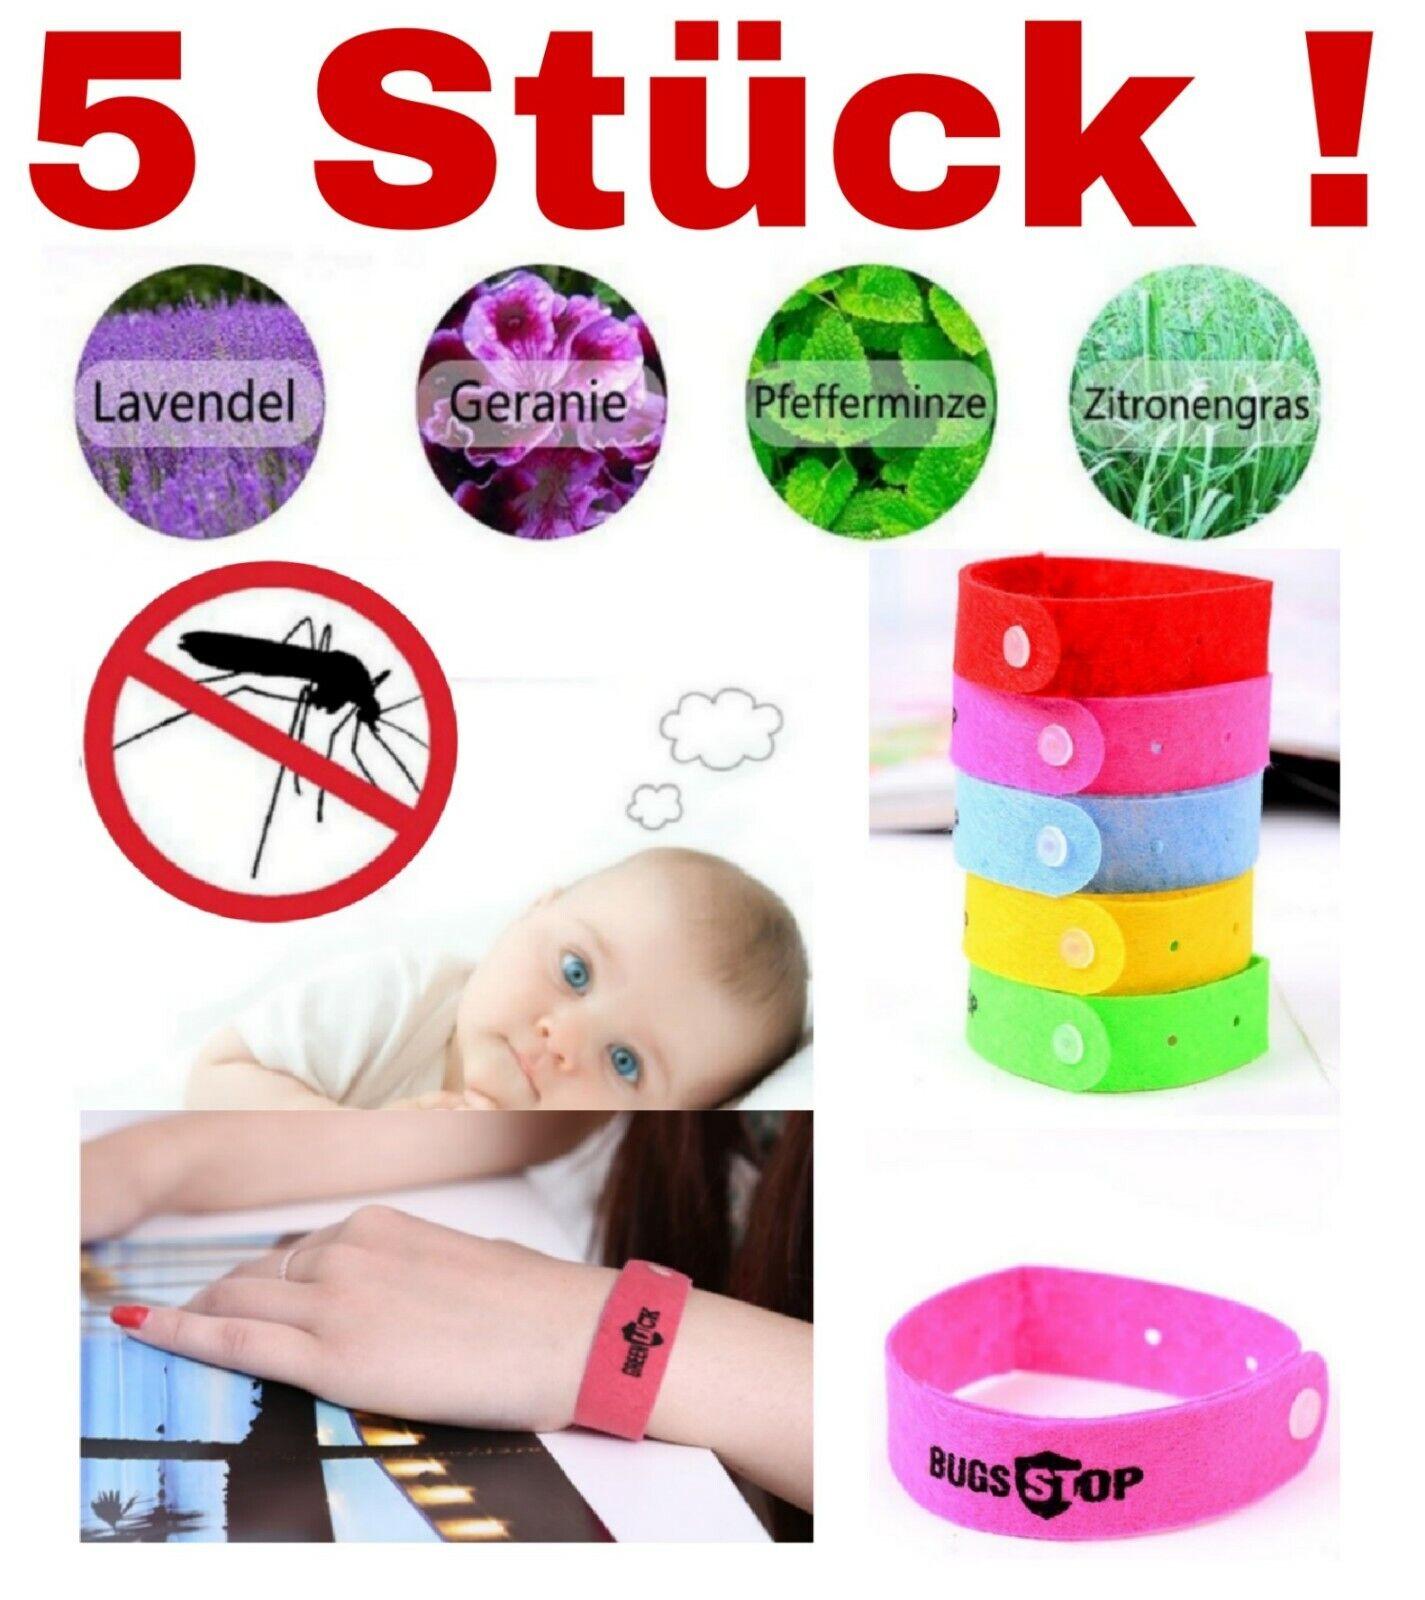 5 Stück Mückenarmband Anti-Mücken Mückenschutz Armband Moskito Insektenschutz